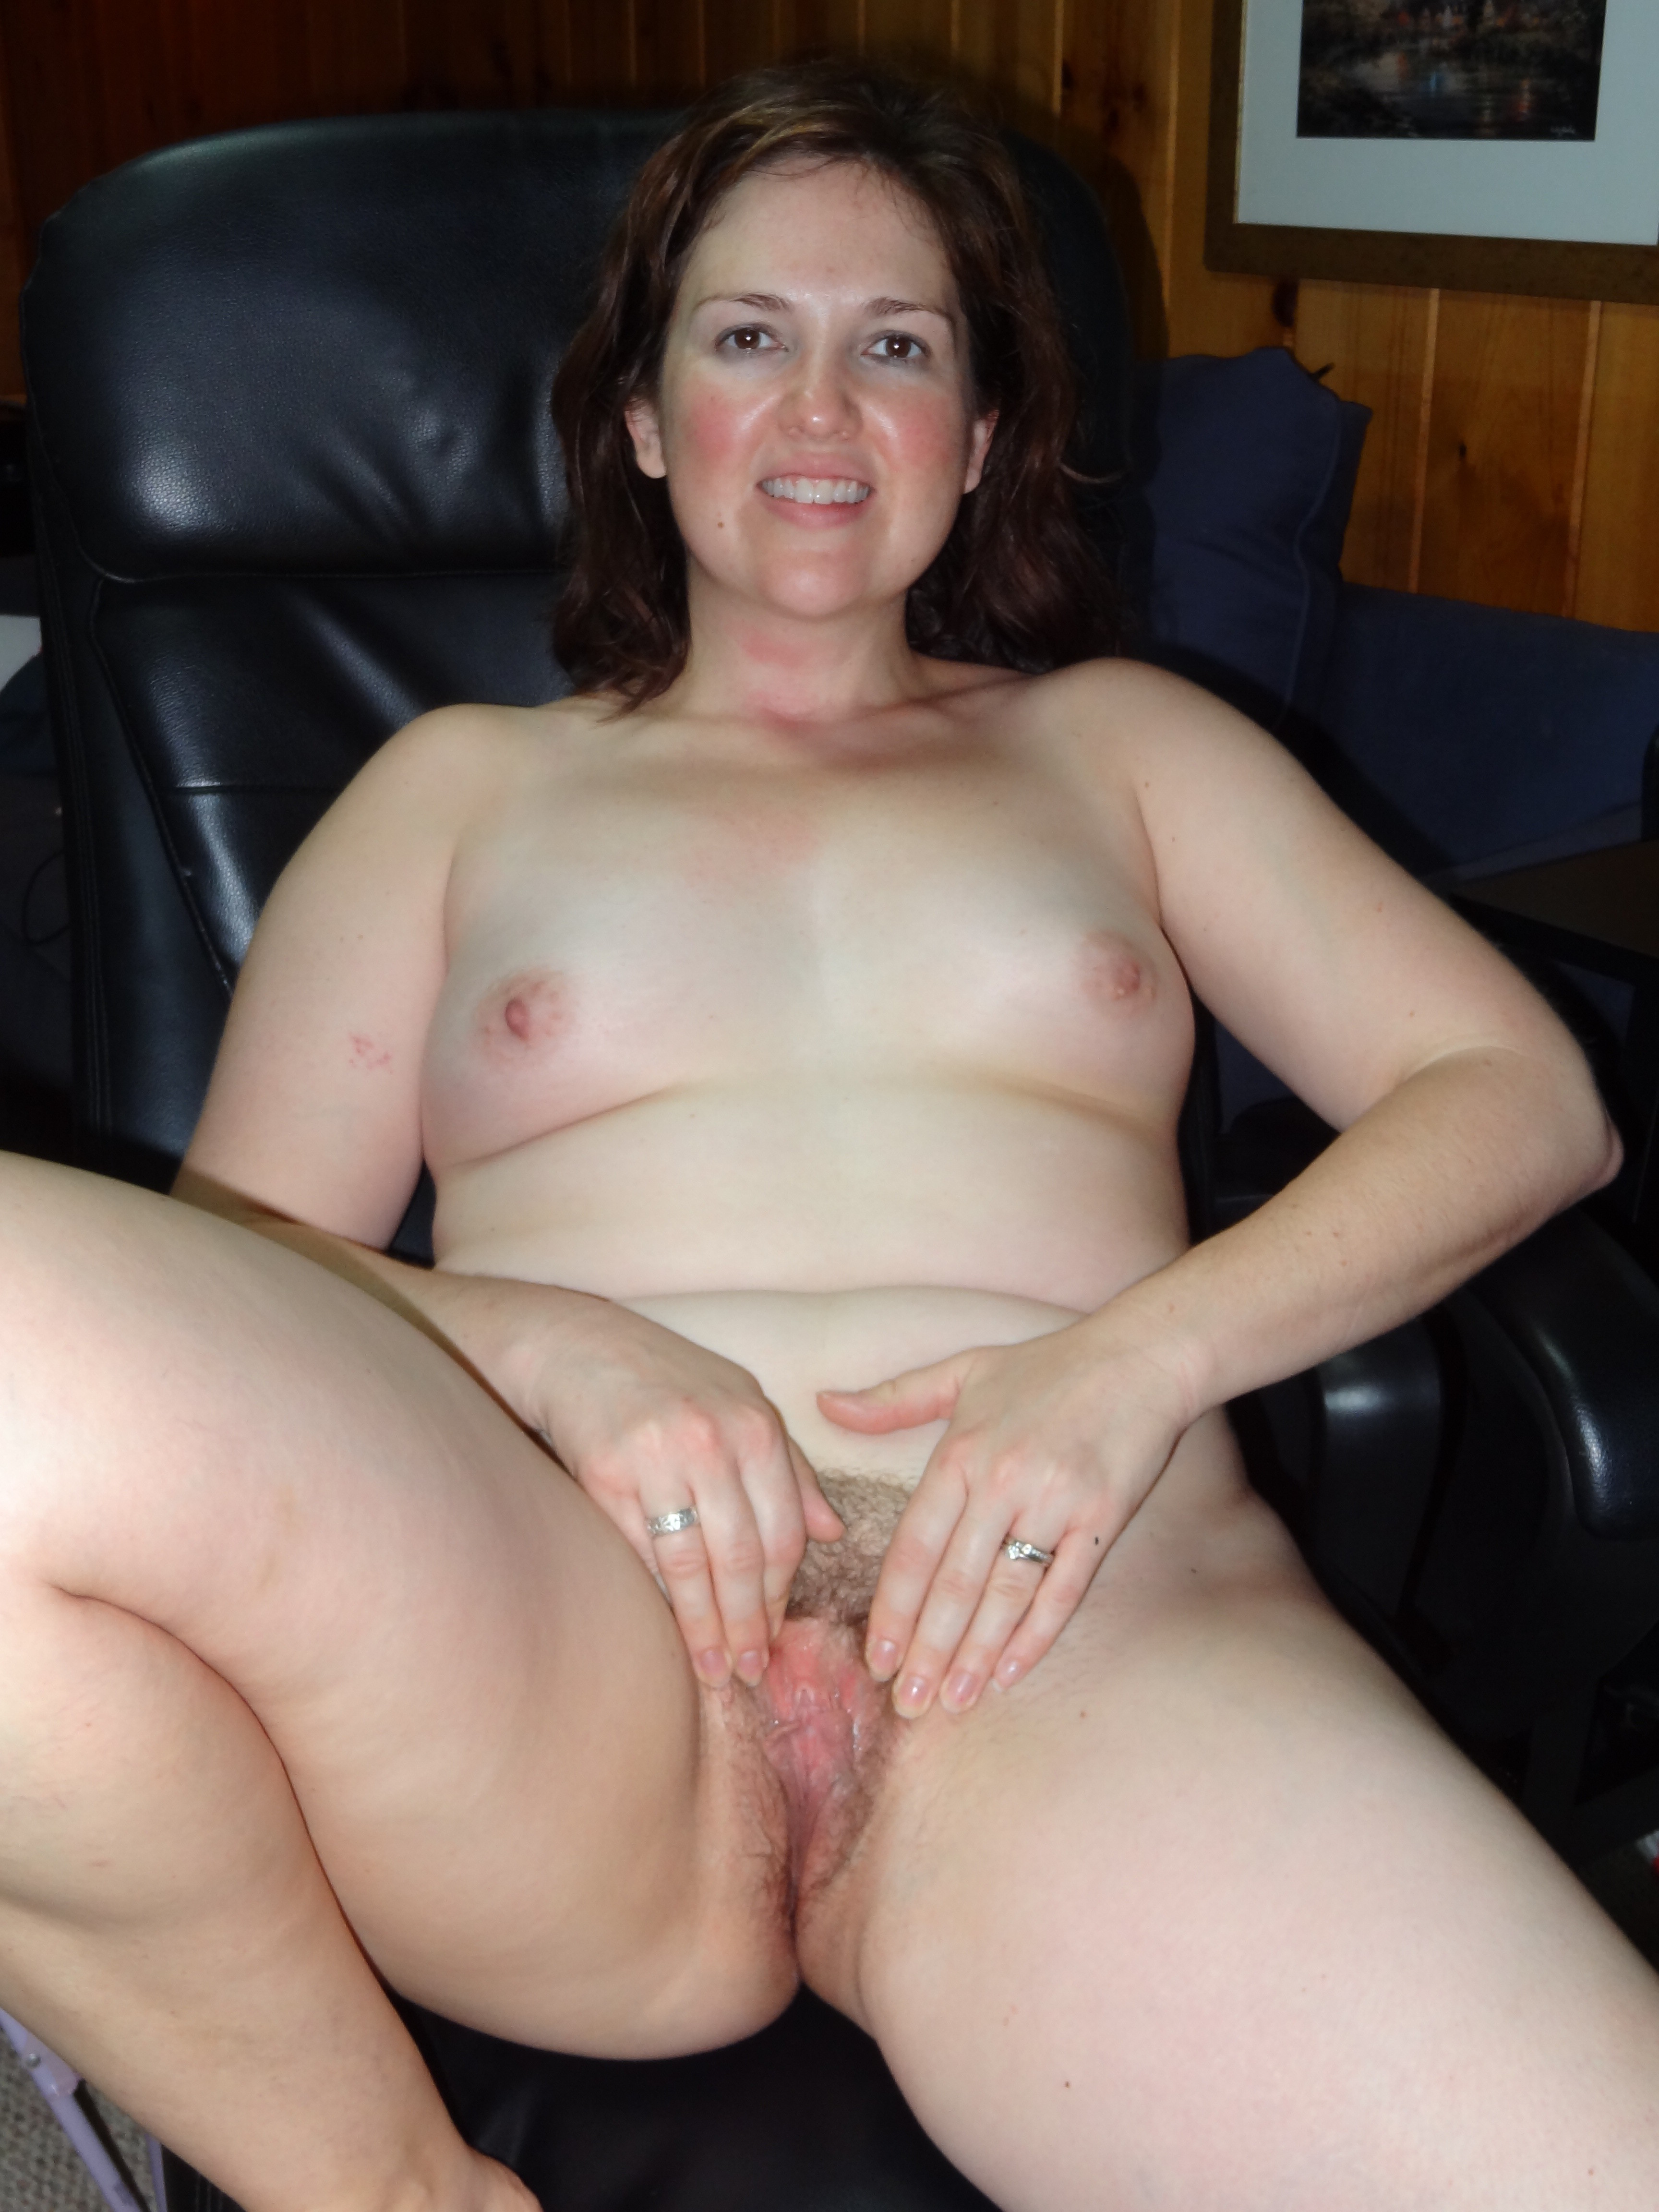 Mature women over 40 nudes